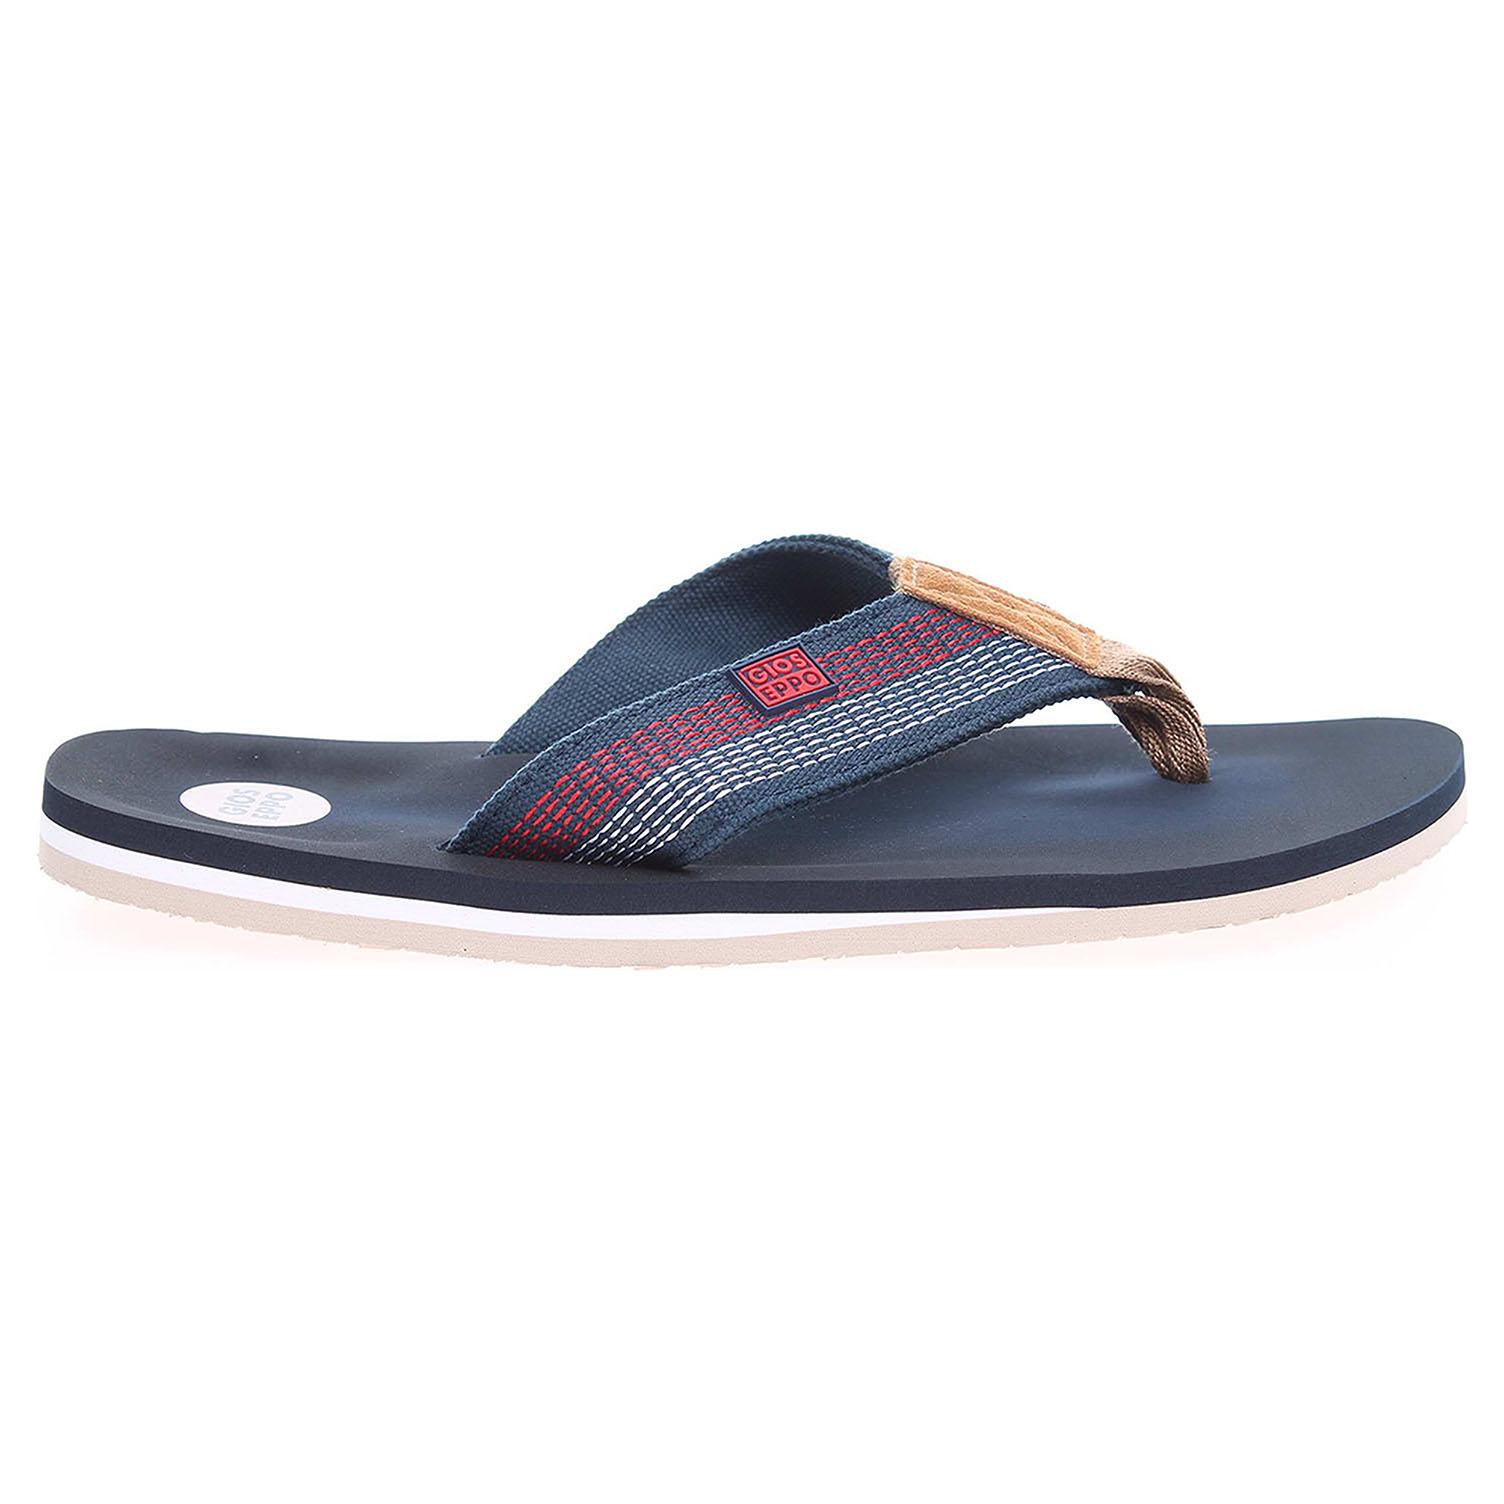 Gioseppo Stone pánské plážové pantofle modré 41